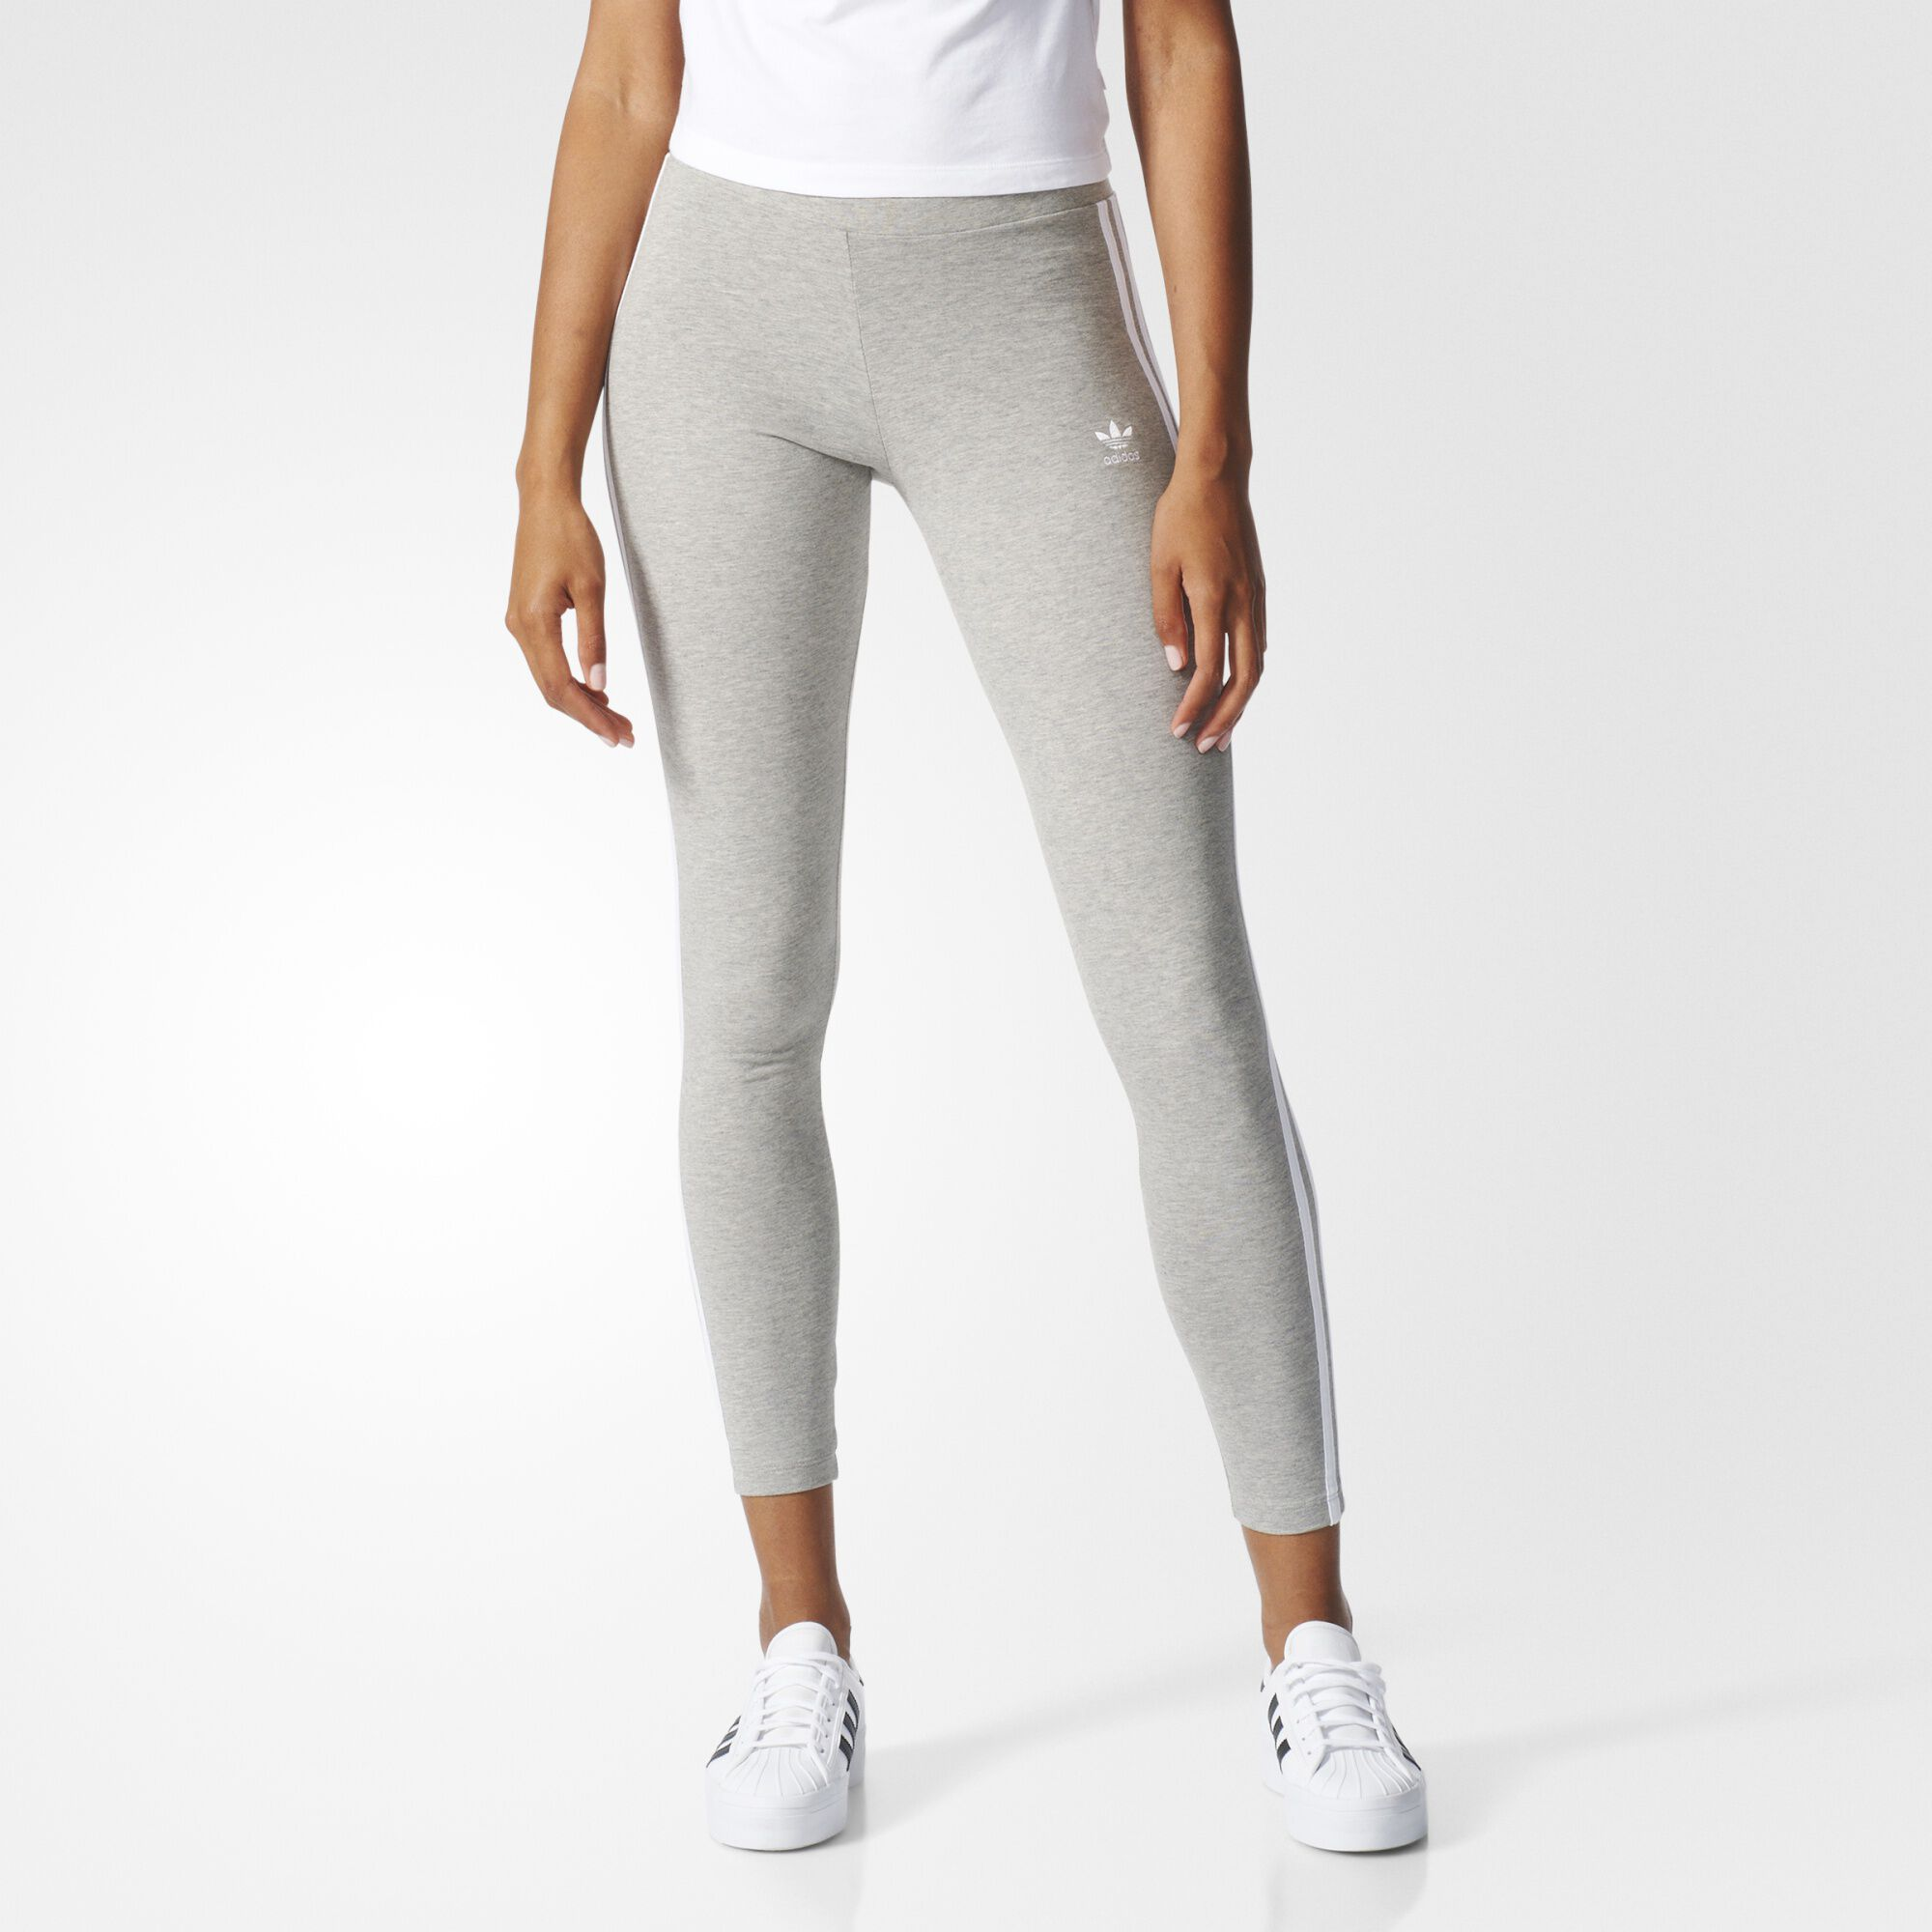 adidas 3 stripes leggings grey adidas us